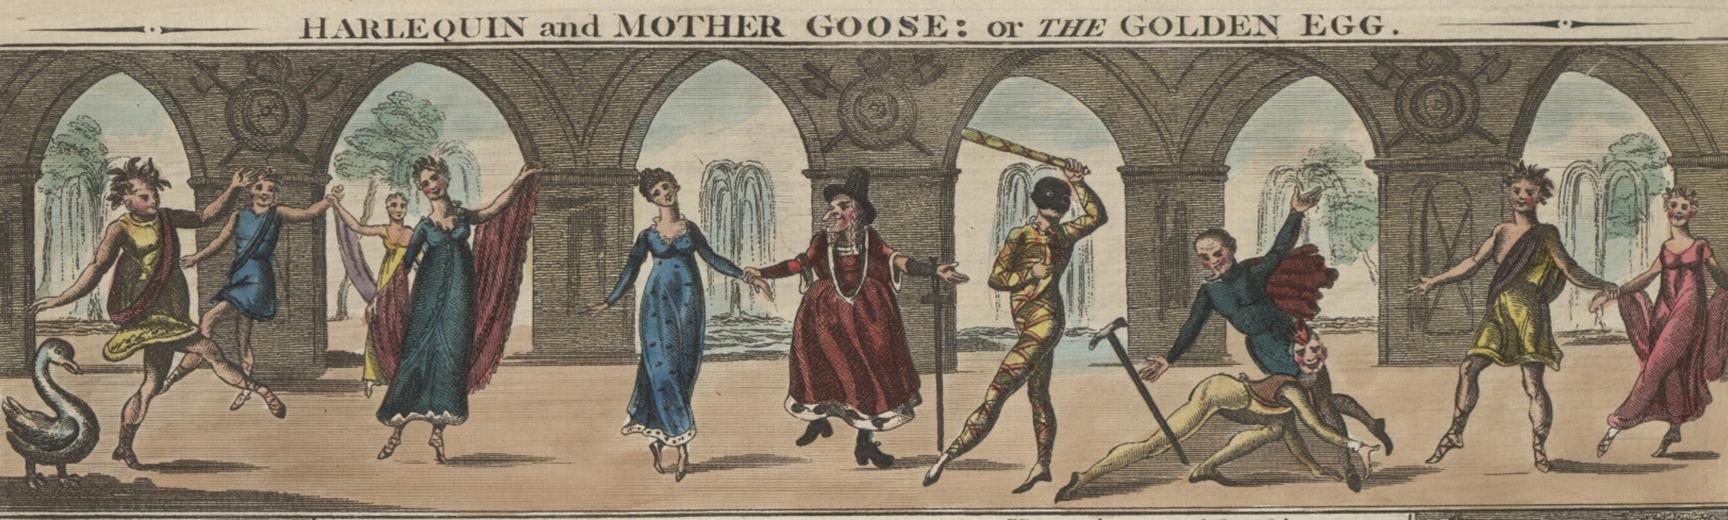 Colour art of pantomime figures dancing